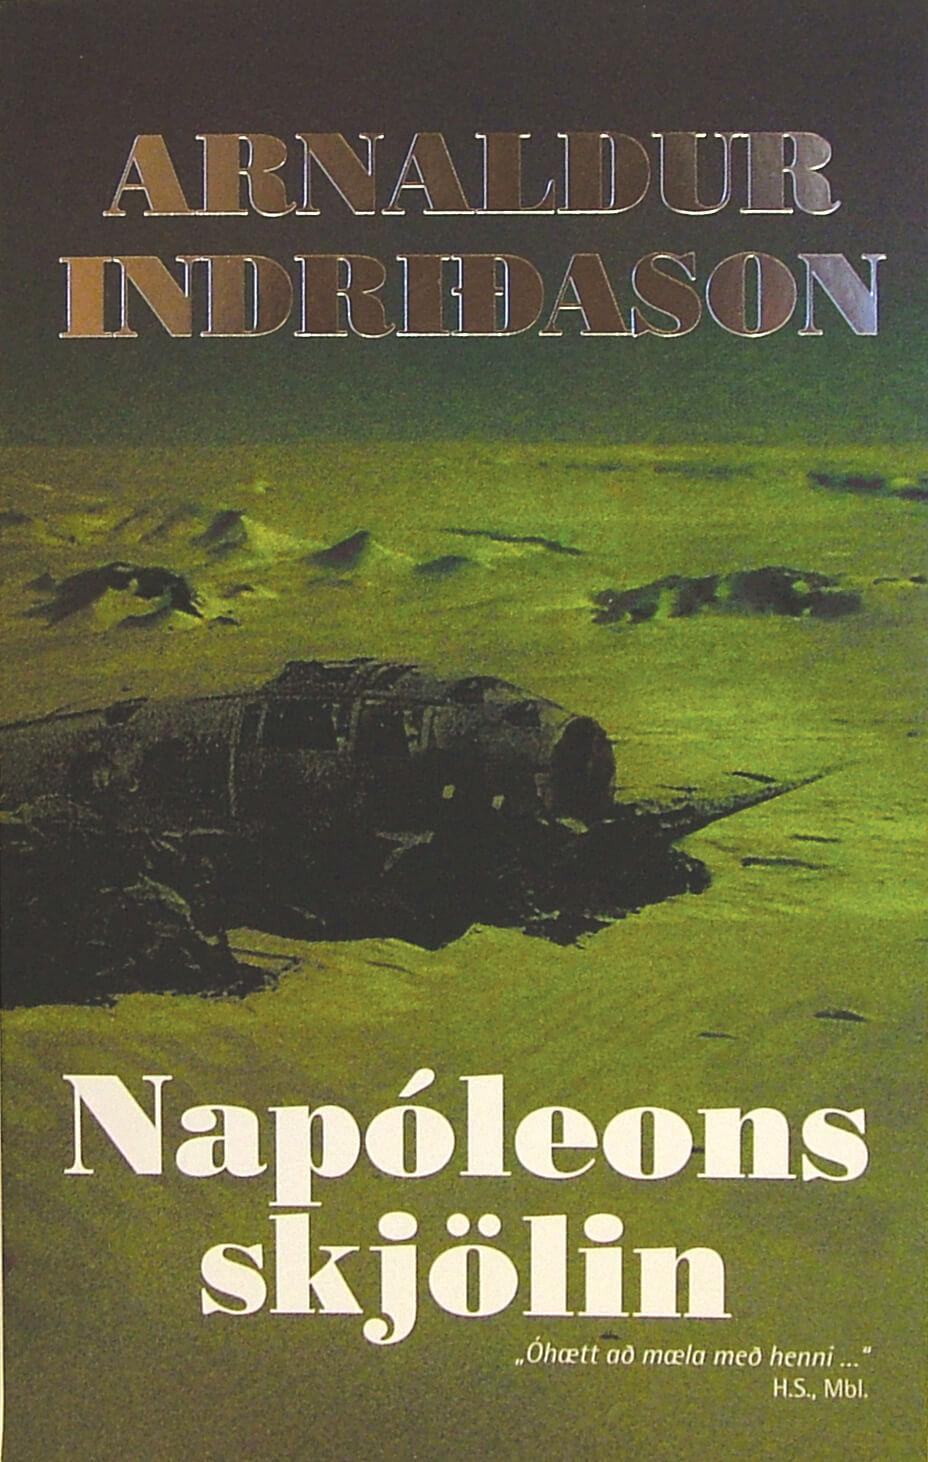 Napóleonsskjölin